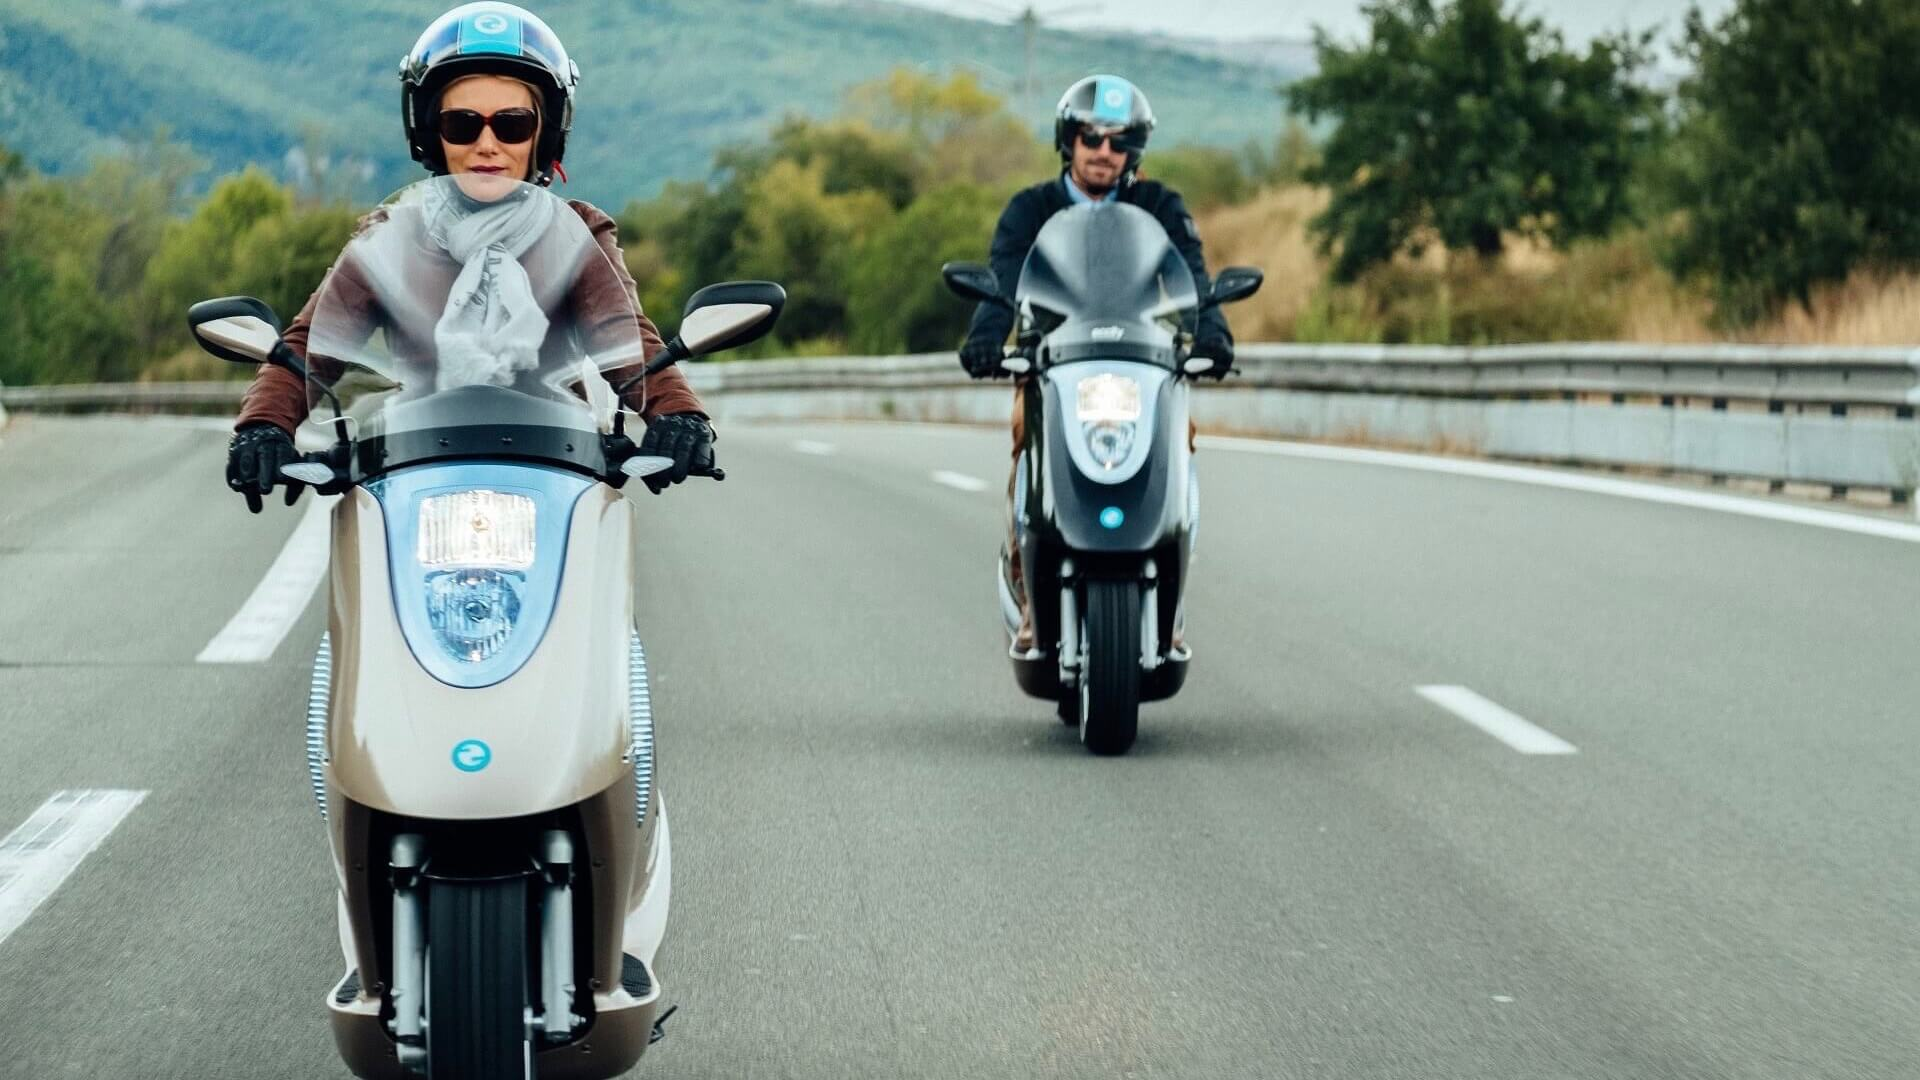 eccity scooter